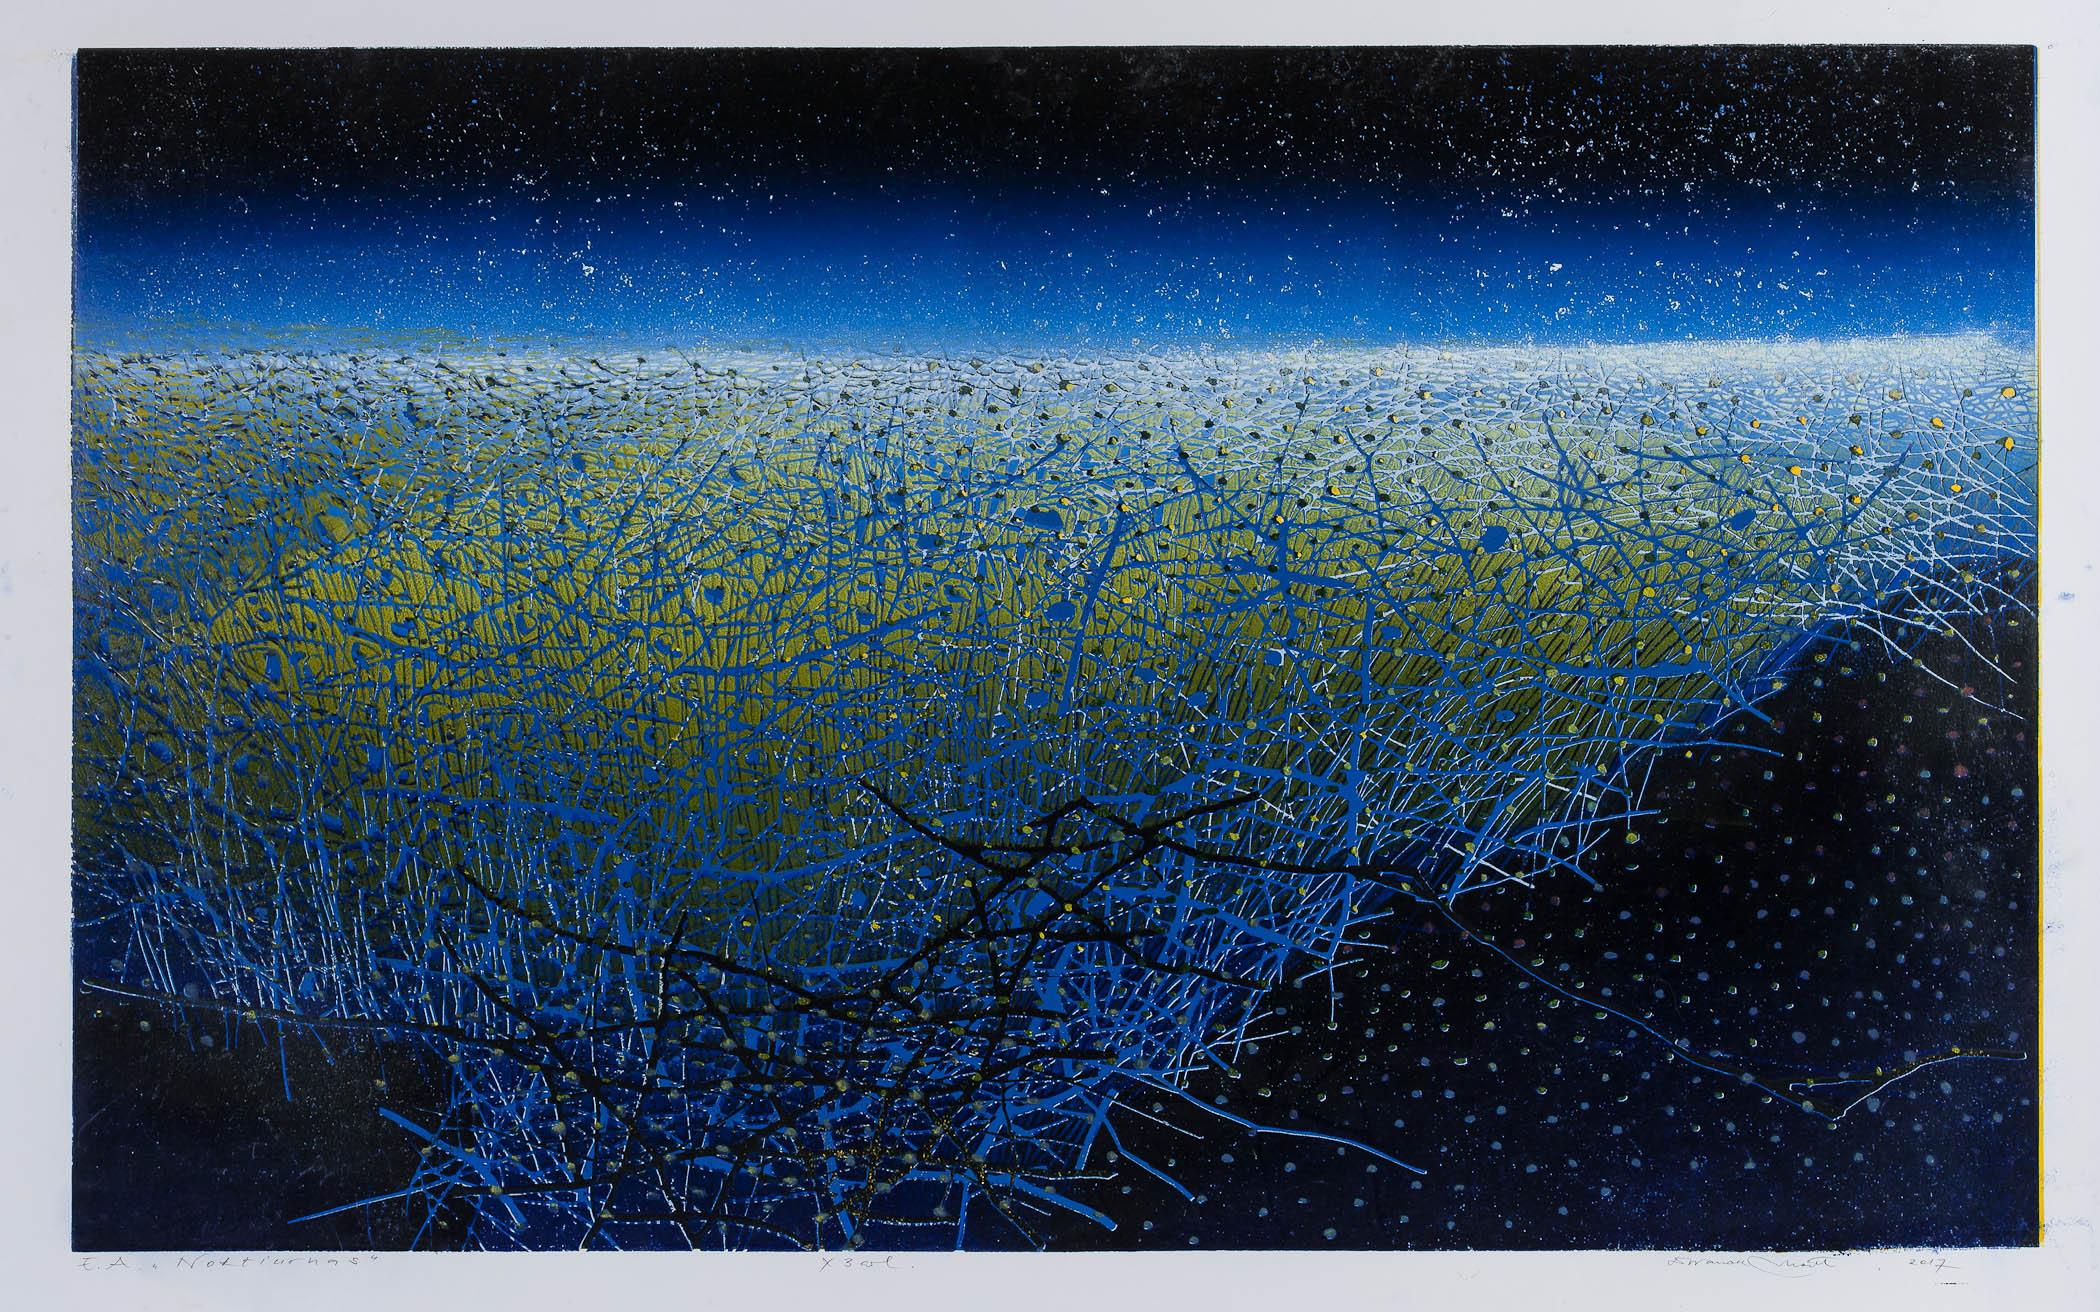 Nocturne -D. Ivanauskaite - colour linocut - Birch Tree Gallery